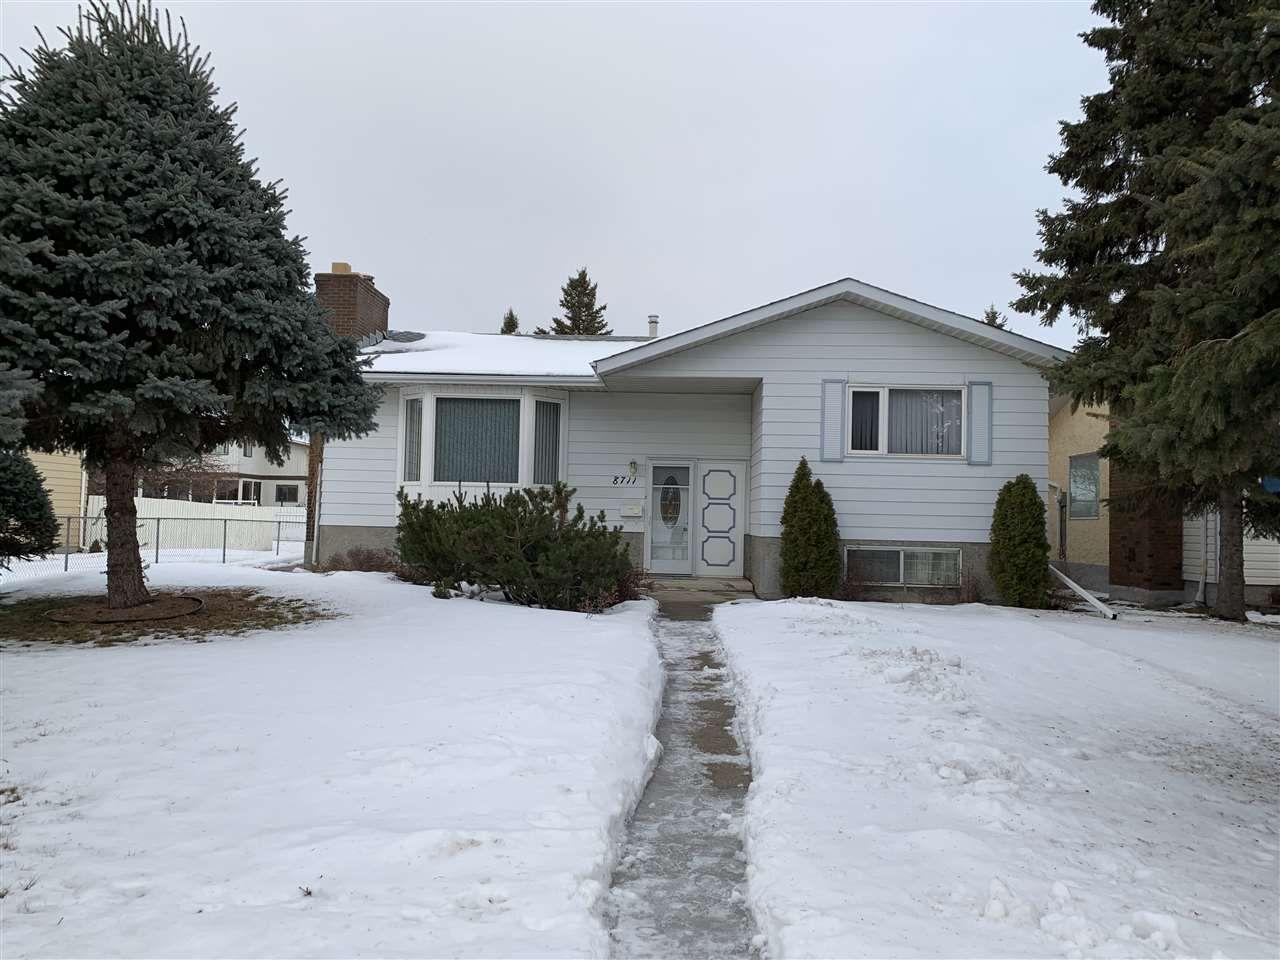 Main Photo: 8711 182 Street in Edmonton: Zone 20 House for sale : MLS®# E4143359